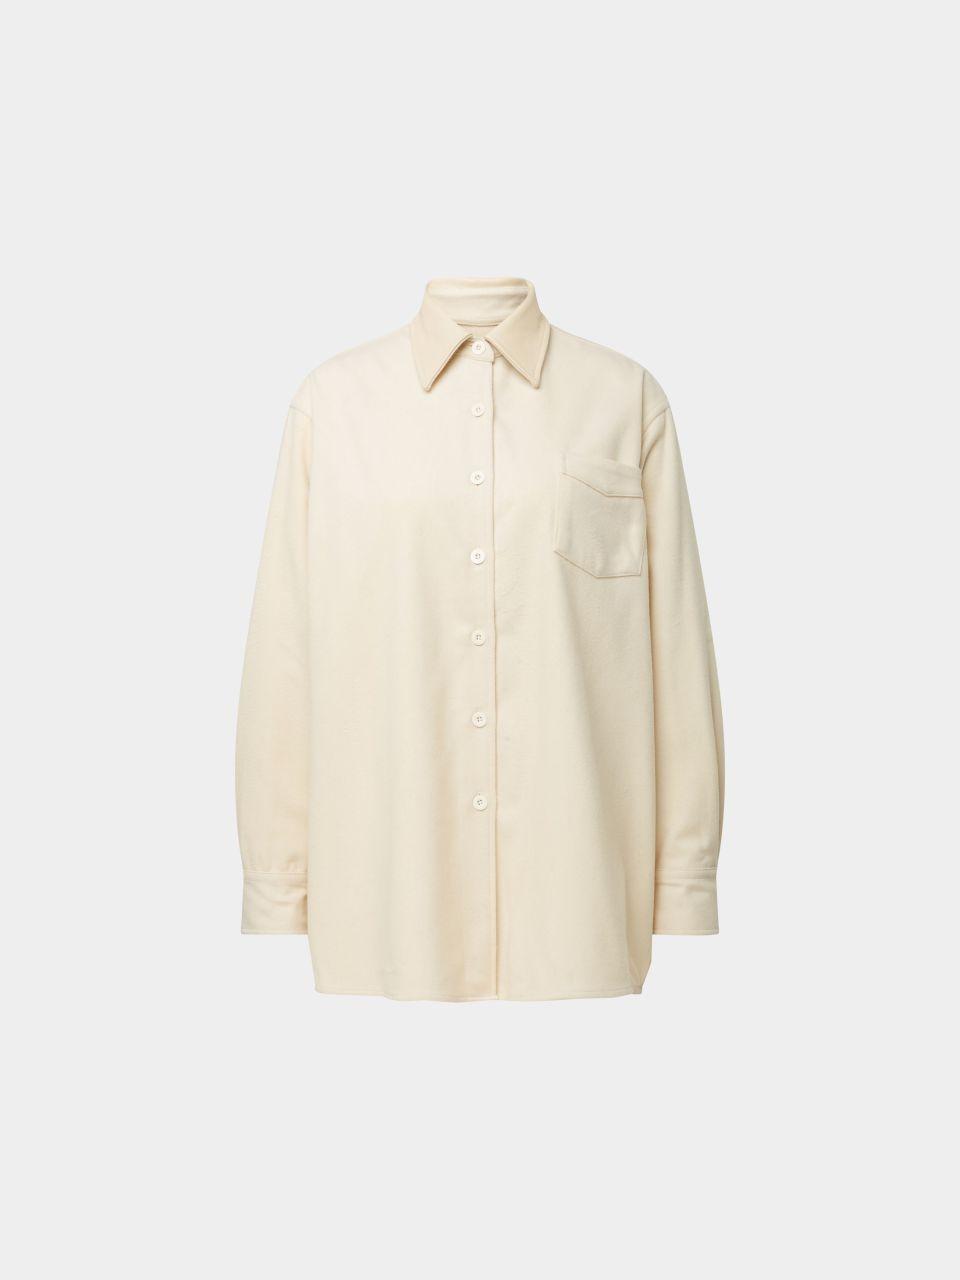 Bluse aus Wolle